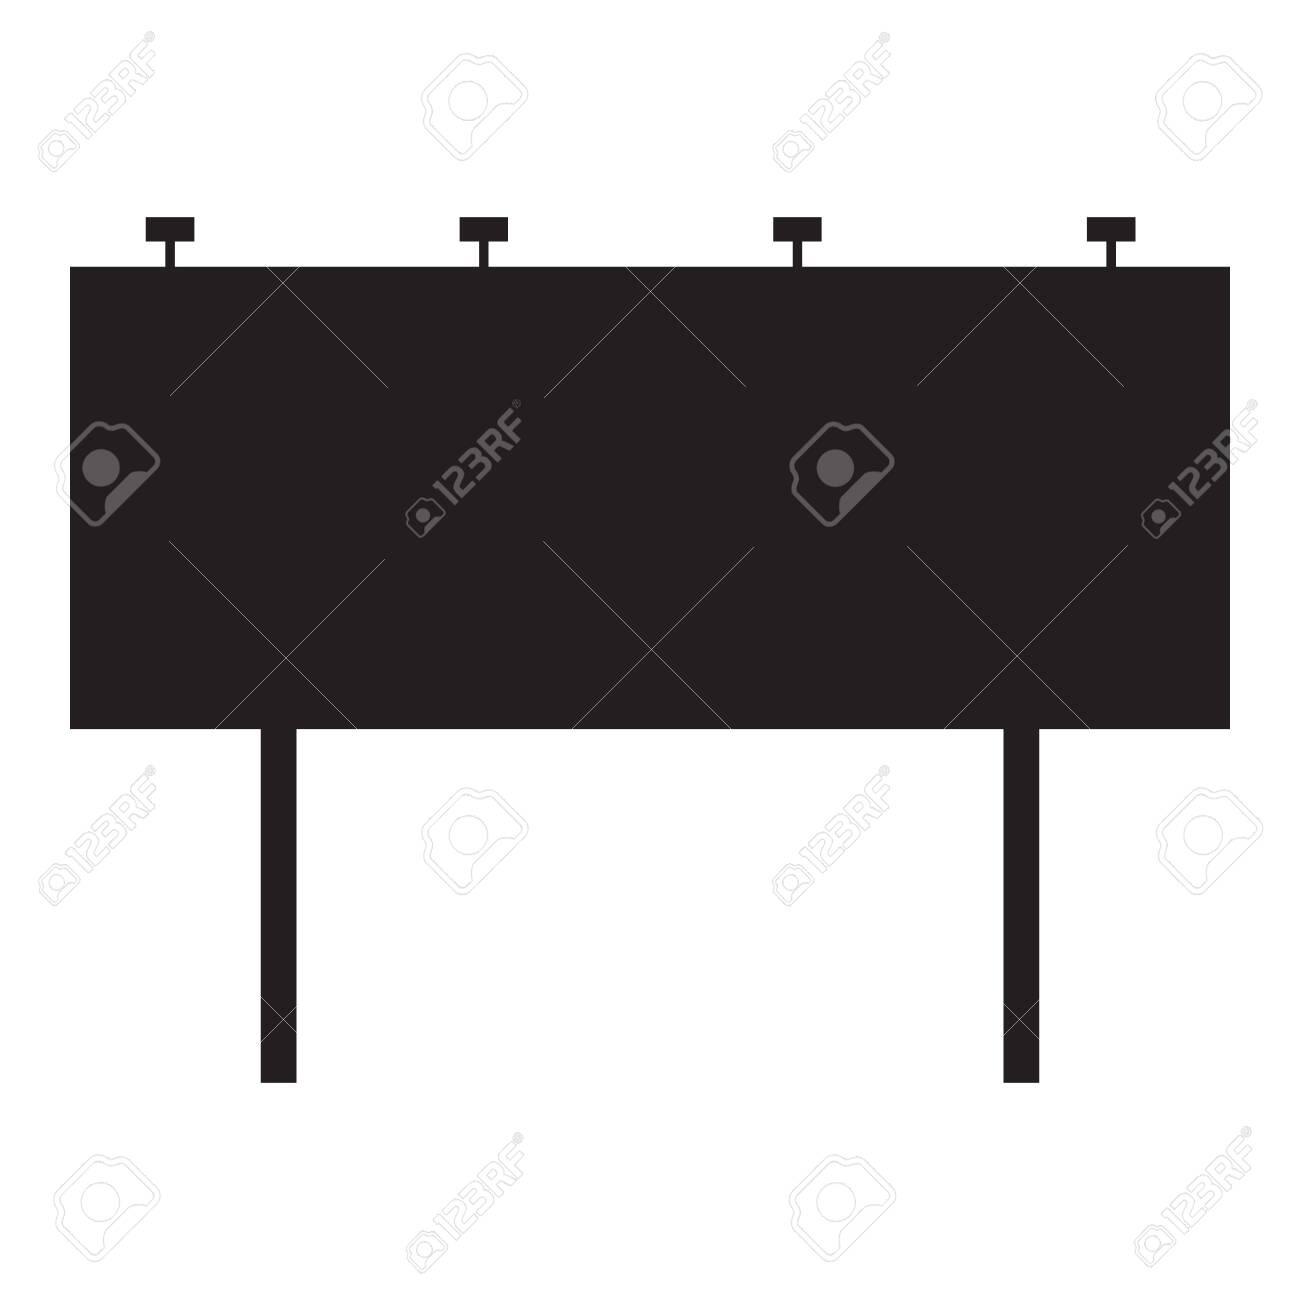 Blank billboard on white background  flat style  Advertising